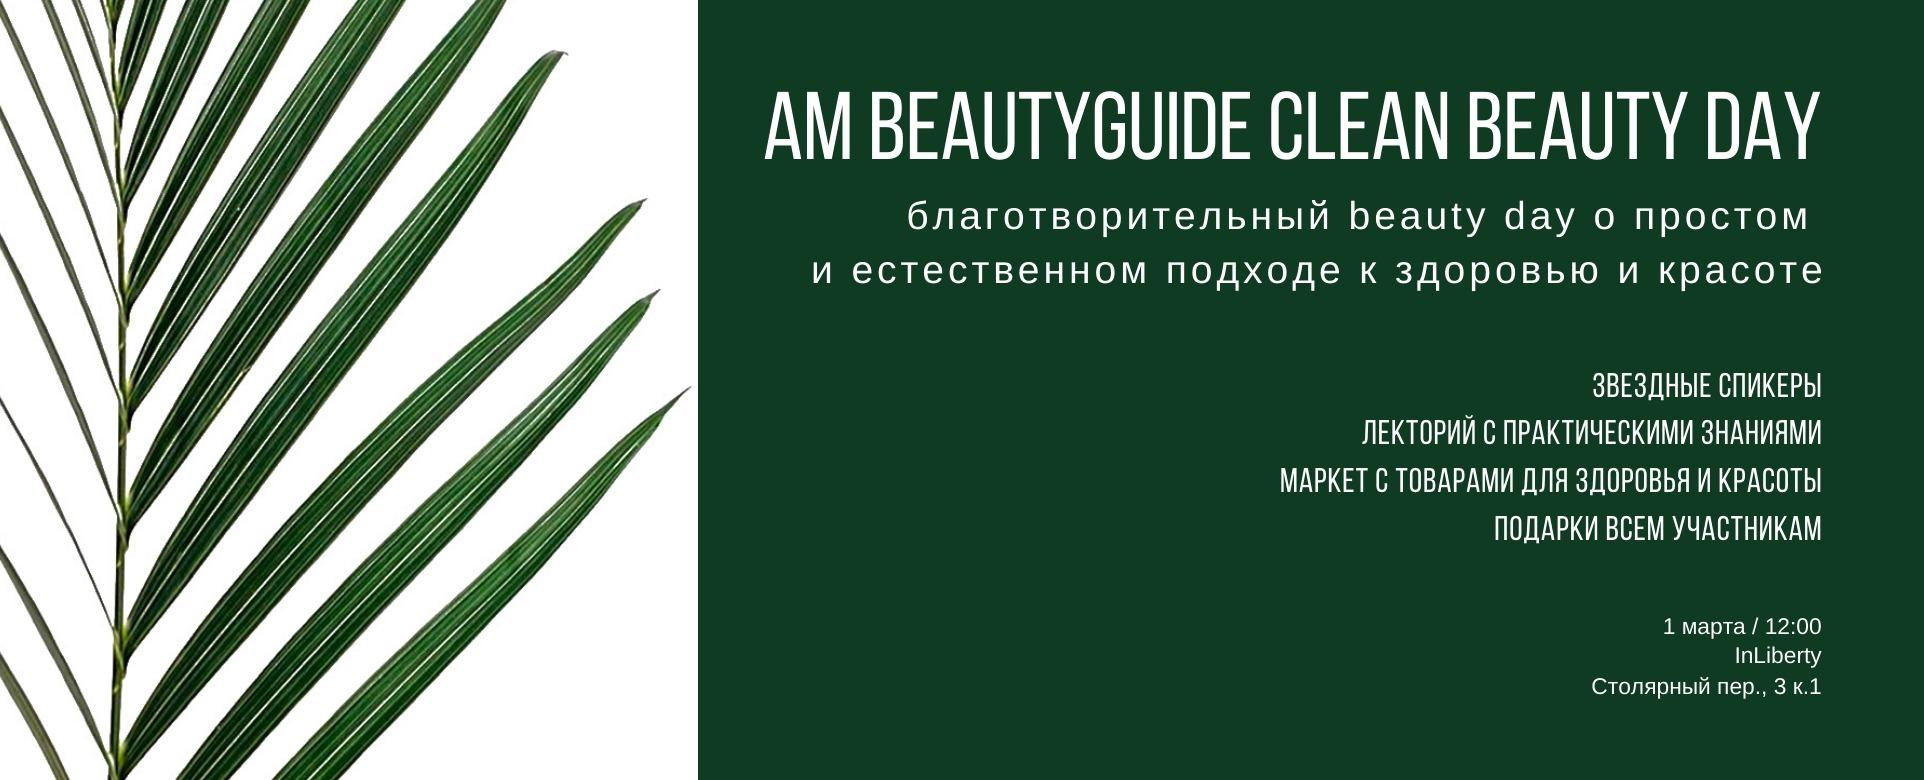 AM BeautyGuide CLEAN BEAUTY DAY